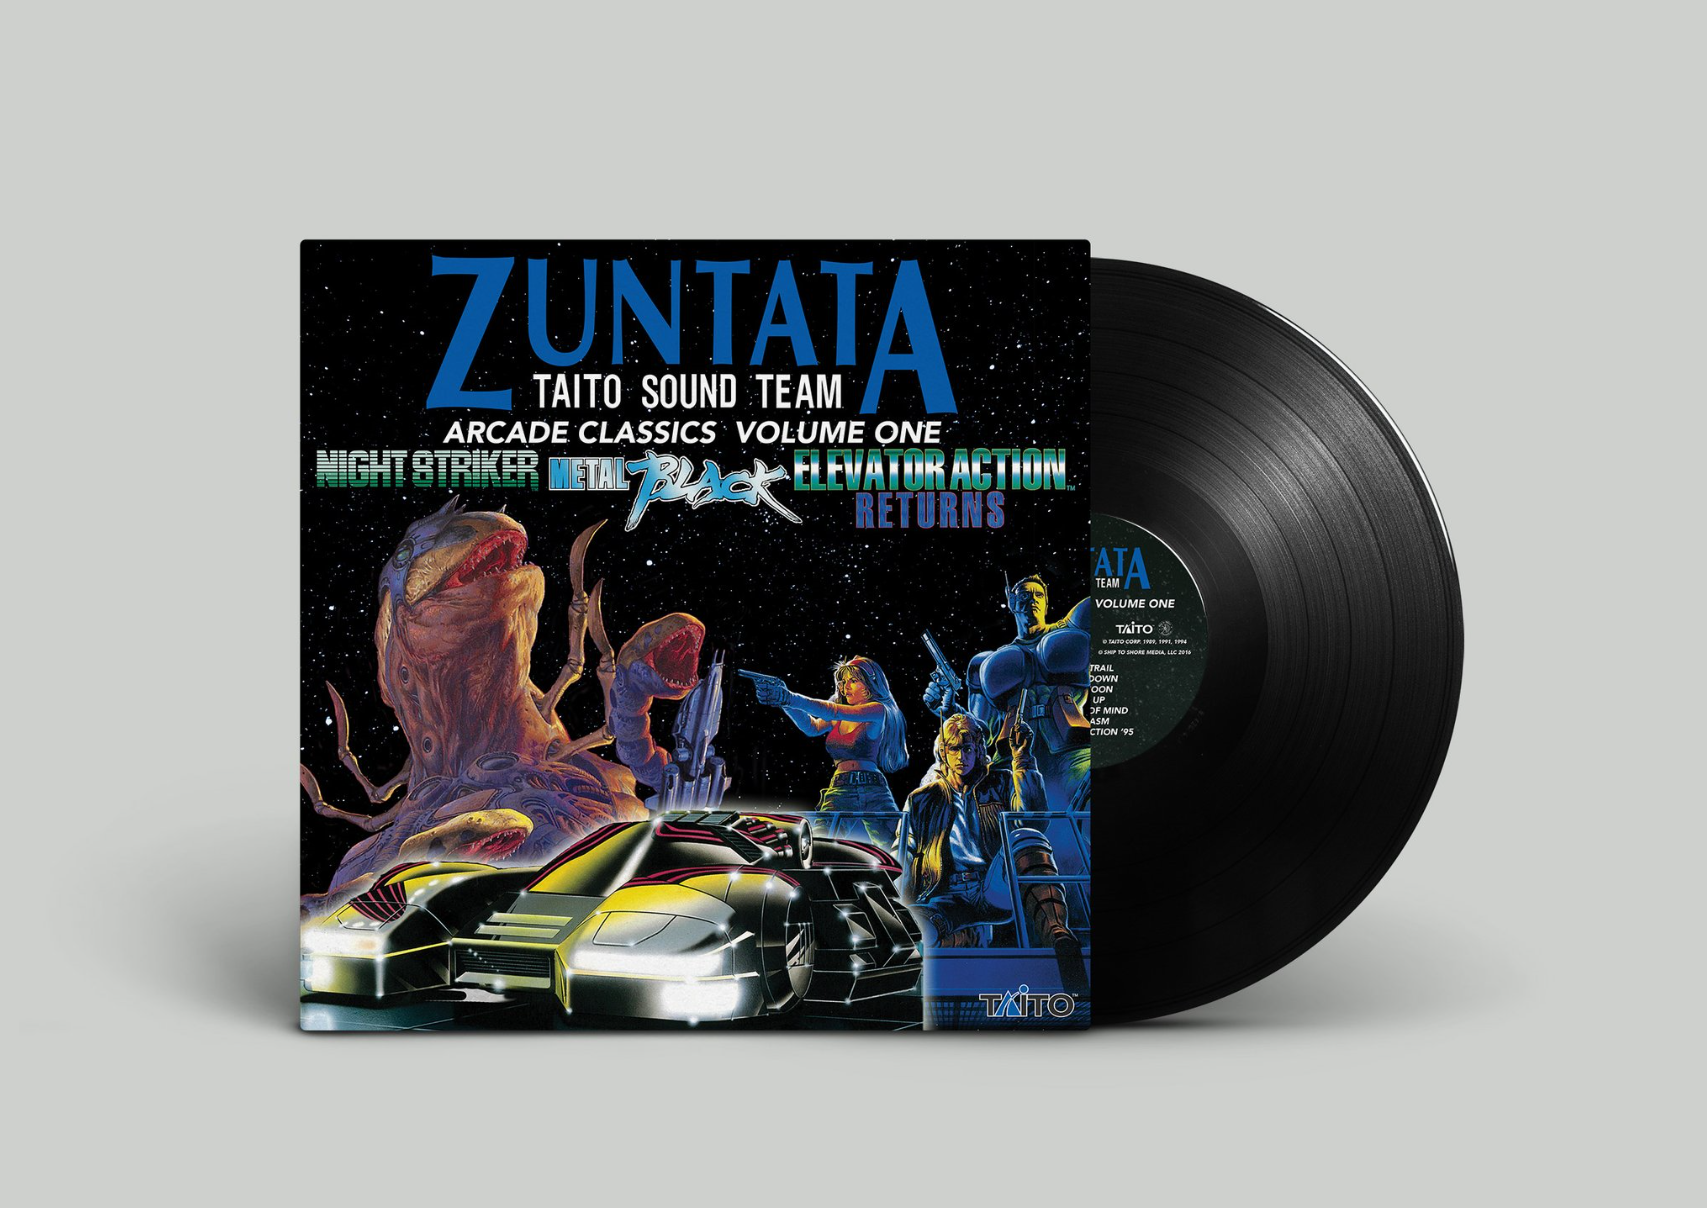 Zuntata Arcade Classics Volume One - Mockup Black